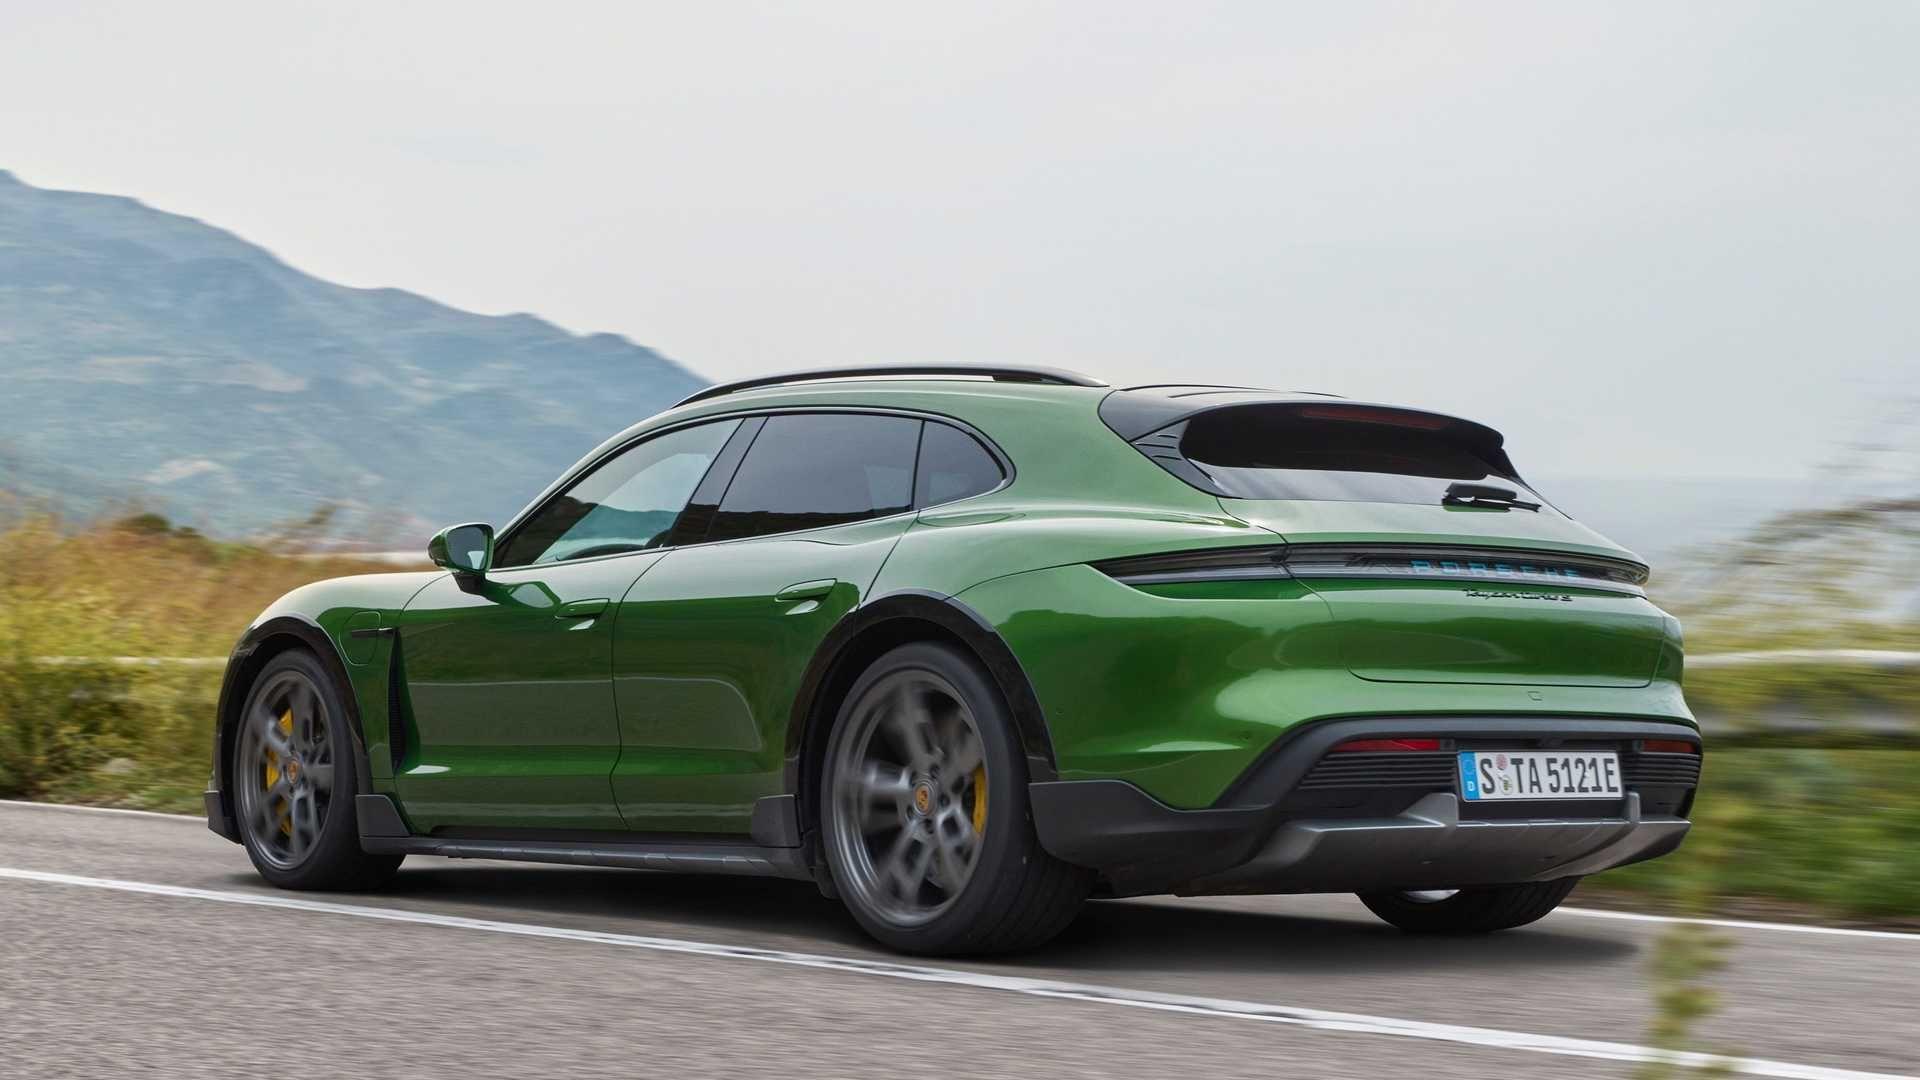 Porsche-Taycan-Cross-Turismo-4